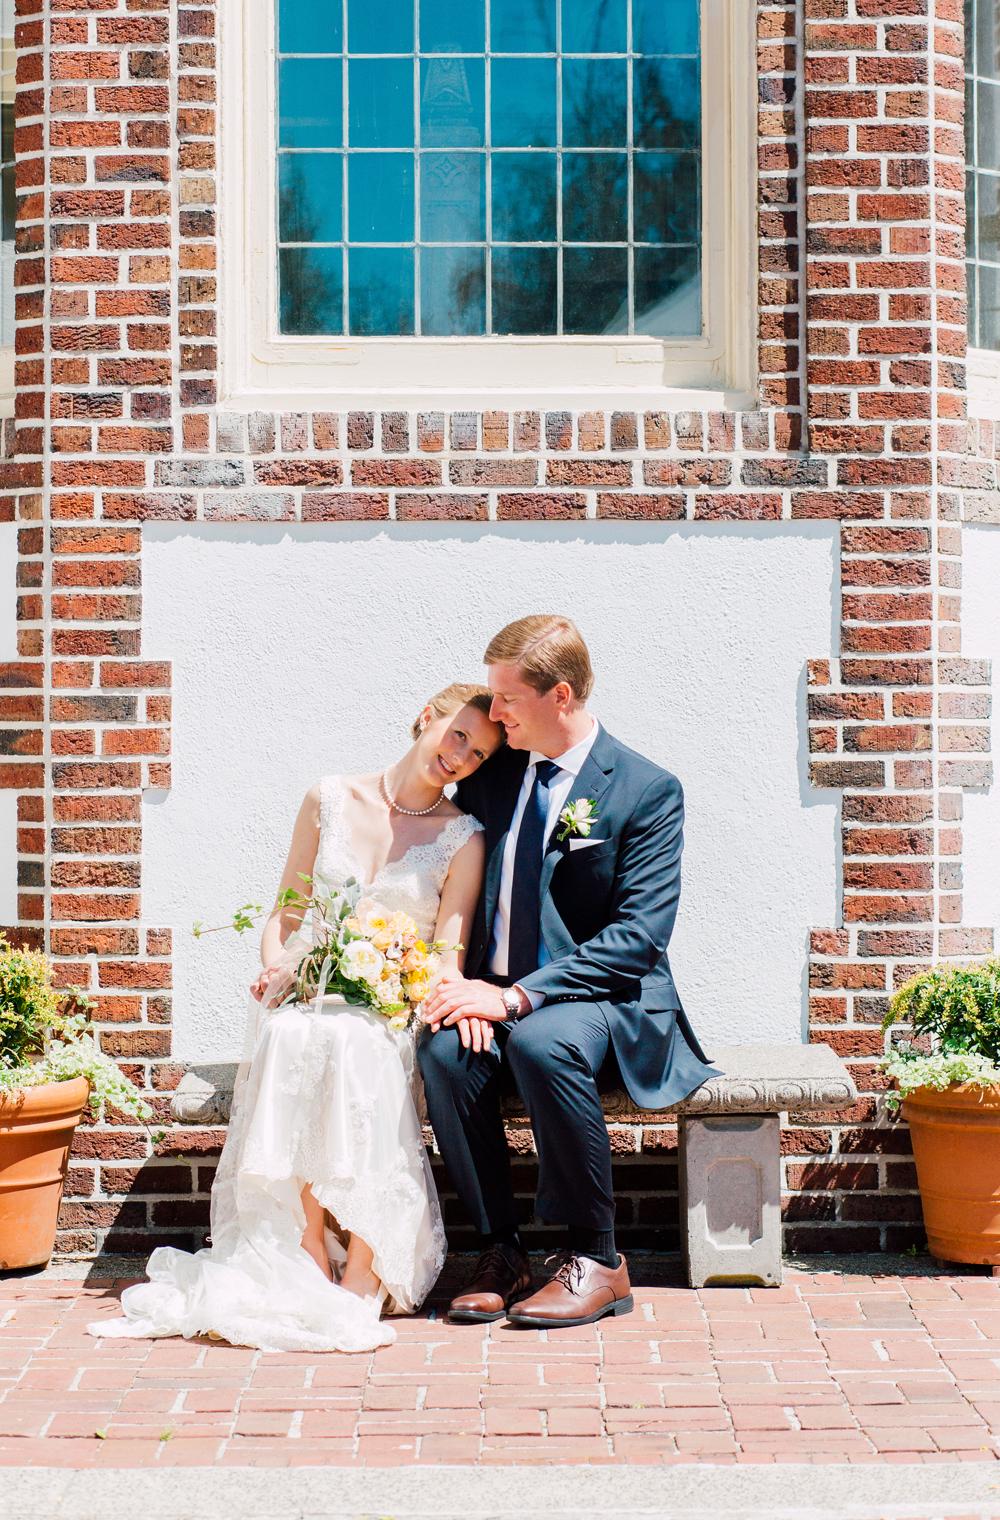 031-bellingham-wedding-photographer-lairmont-manor-katheryn-moran-photography-katie-mickey.jpg